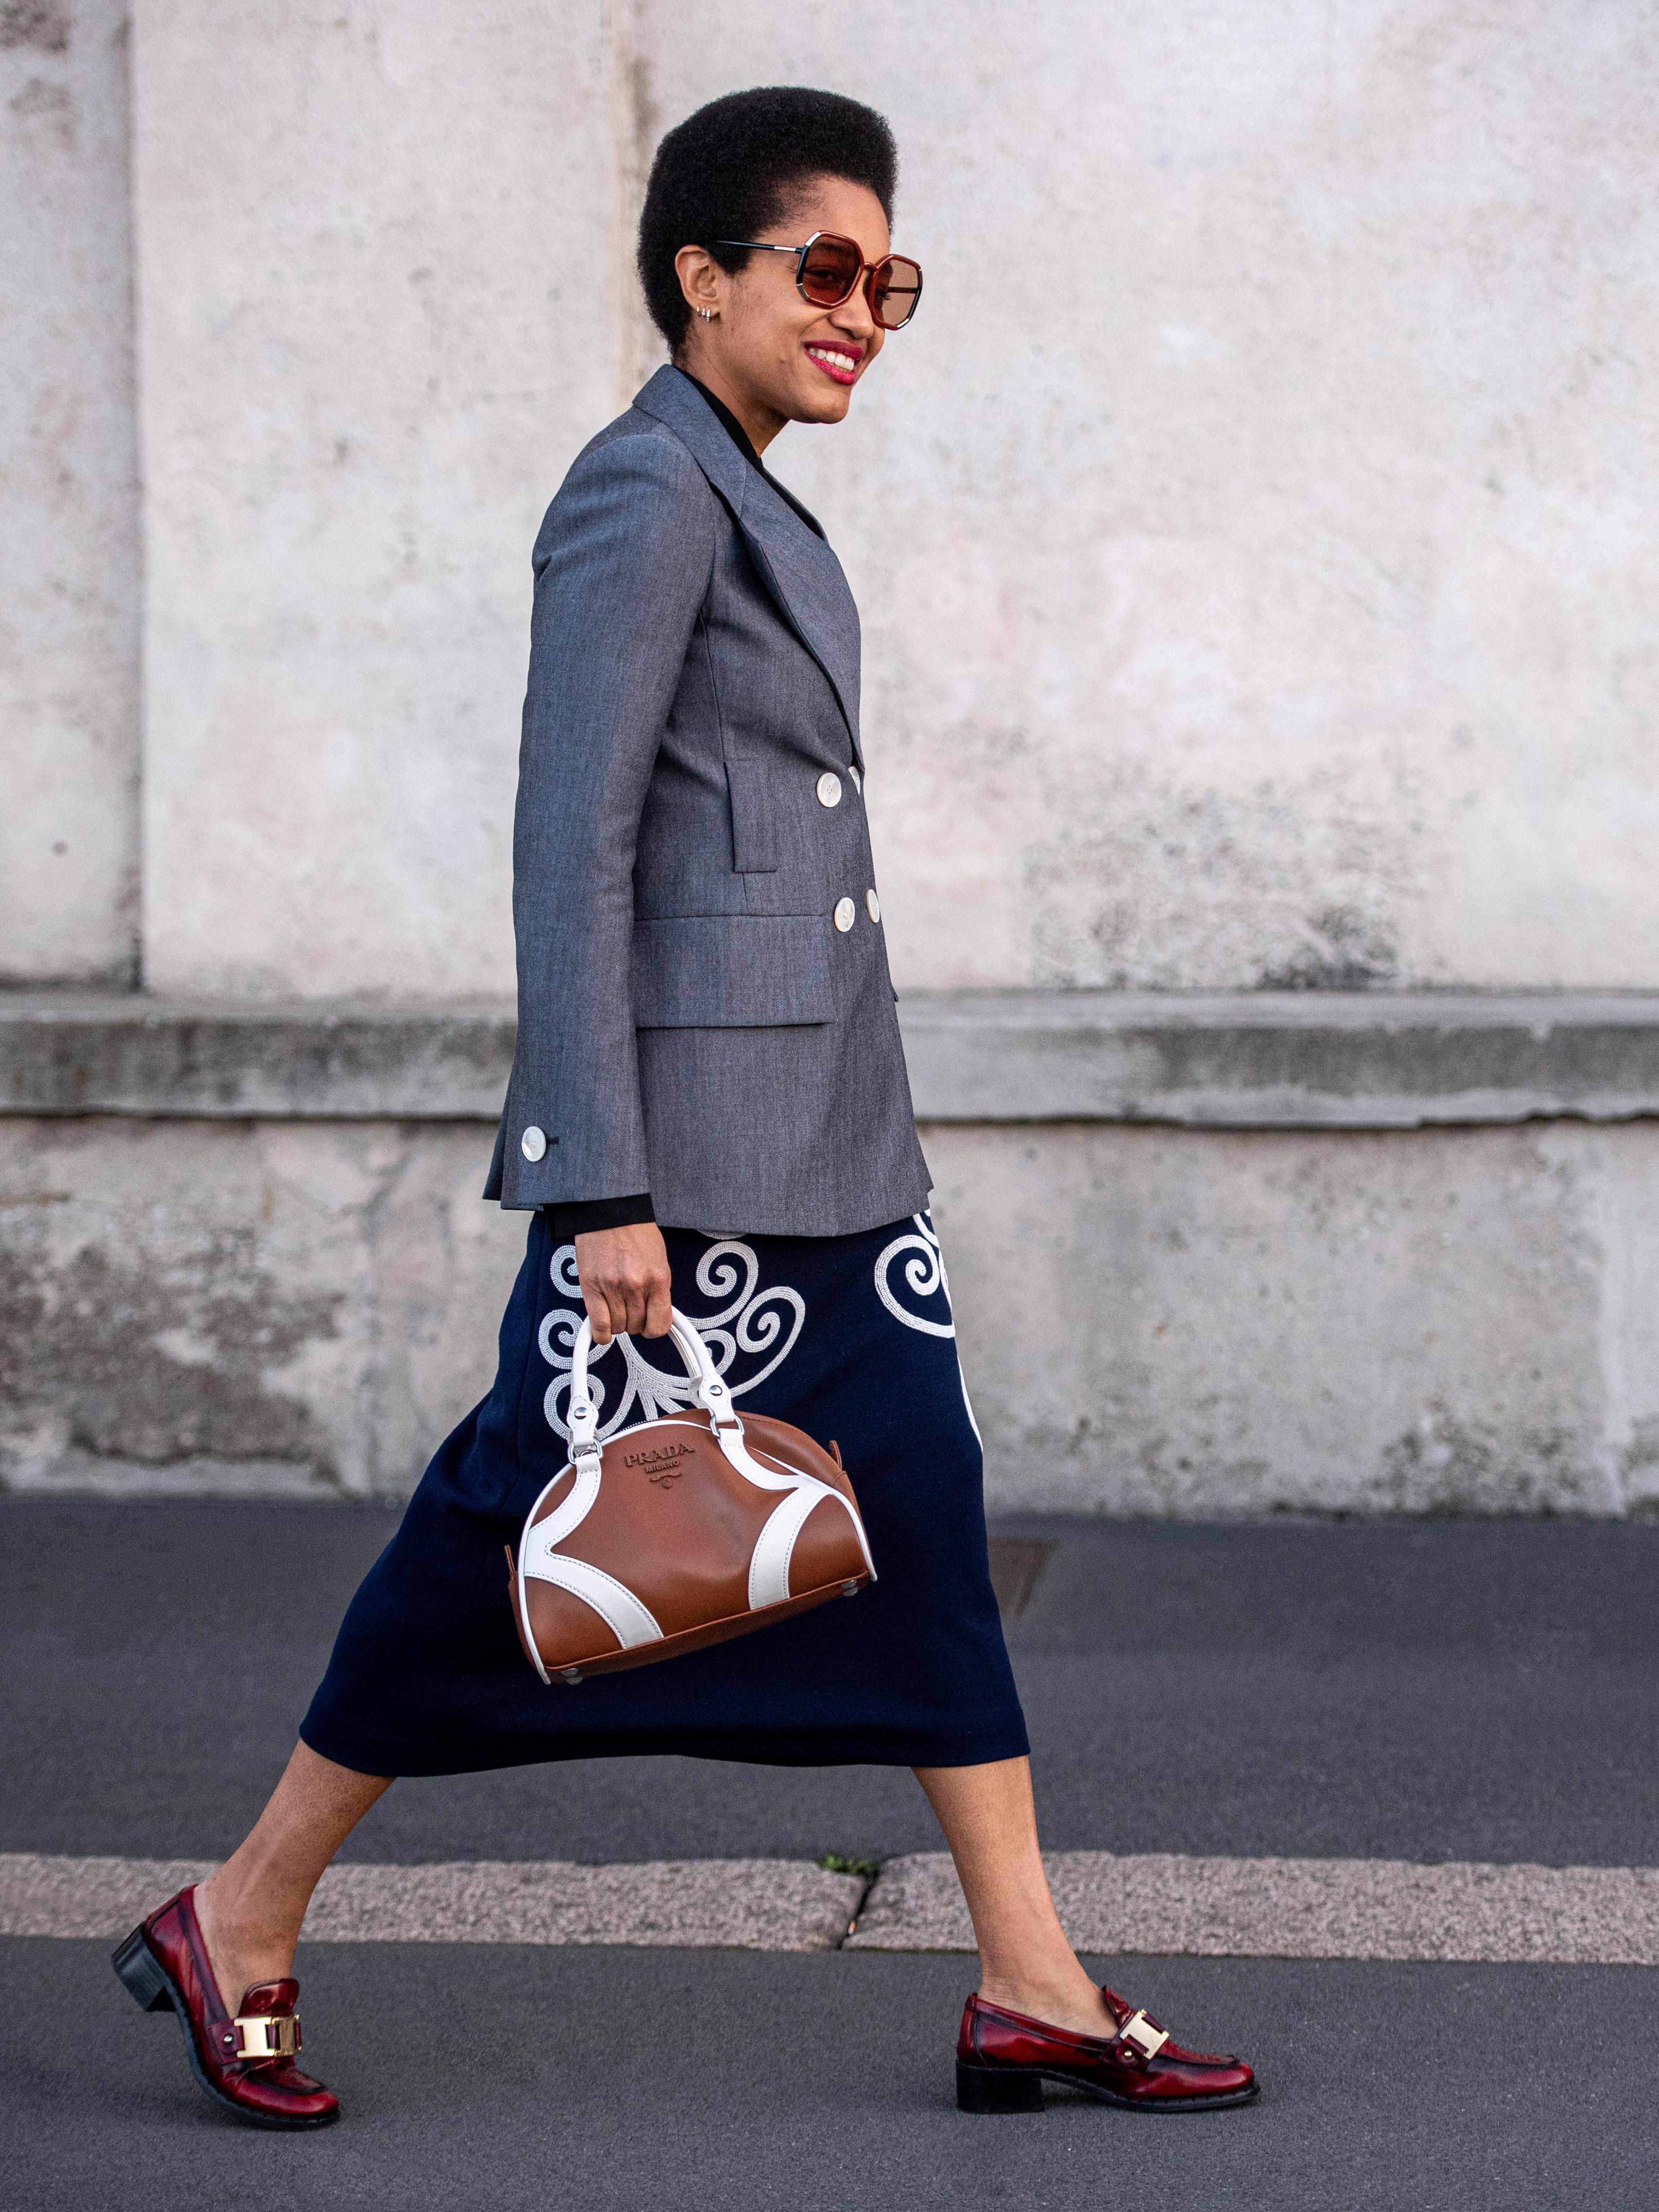 Capsule Wardrobe 2021 The Closet Essentials To Own Porter